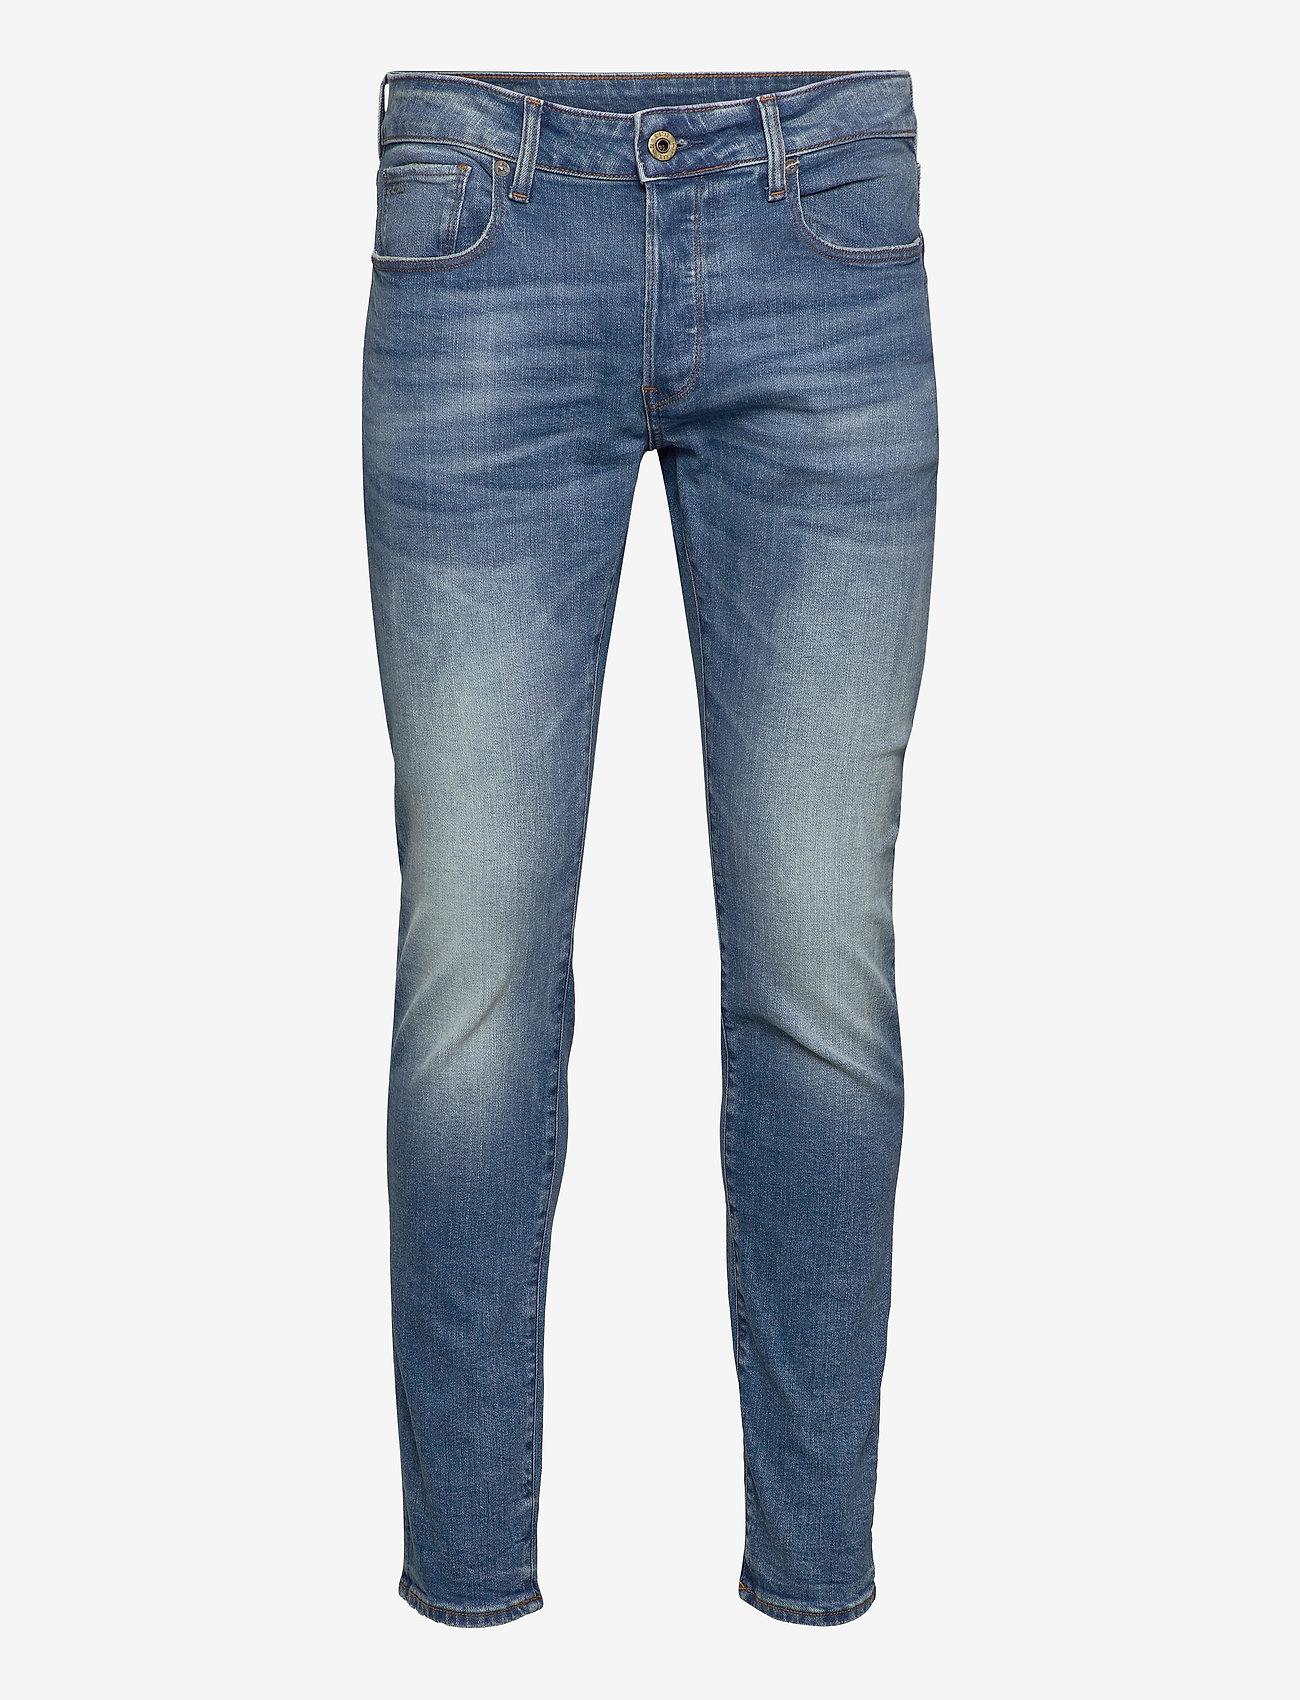 G-star RAW - 3301 Slim - slim jeans - authentic faded blue - 0